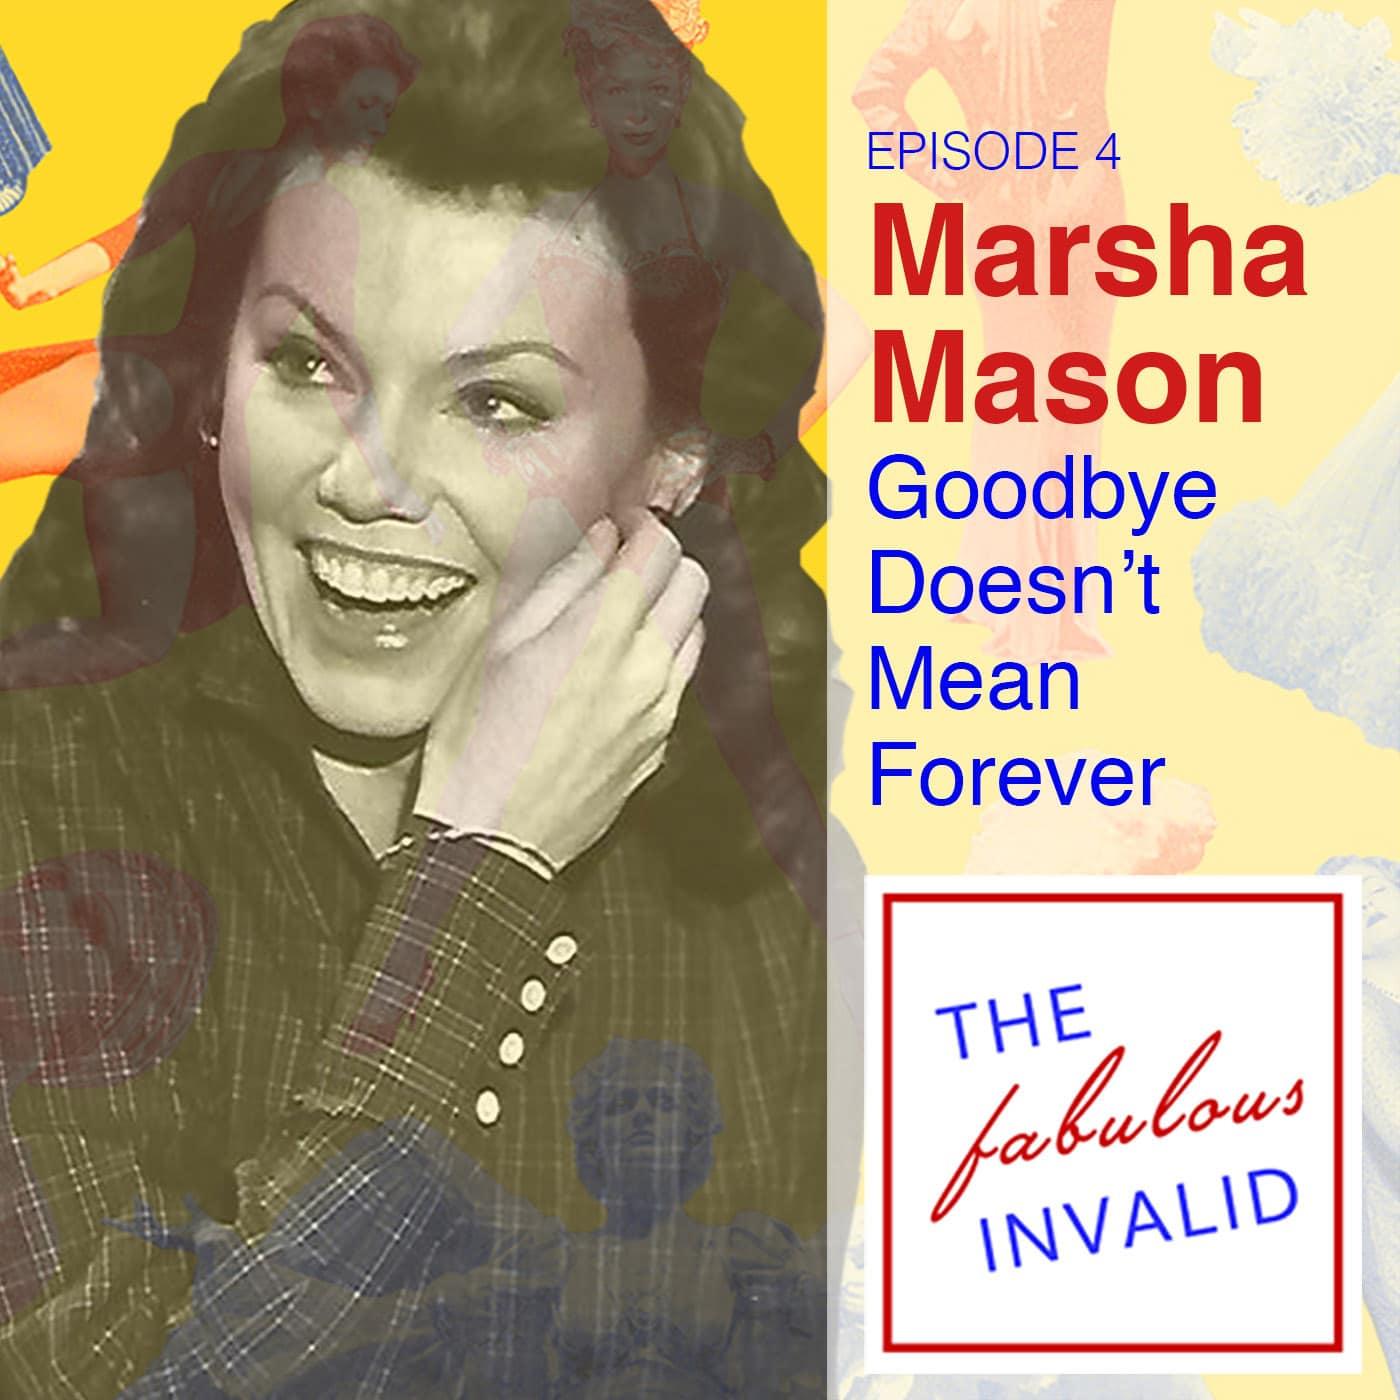 The Fabulous Invalid Ep 4 Marsha Mason